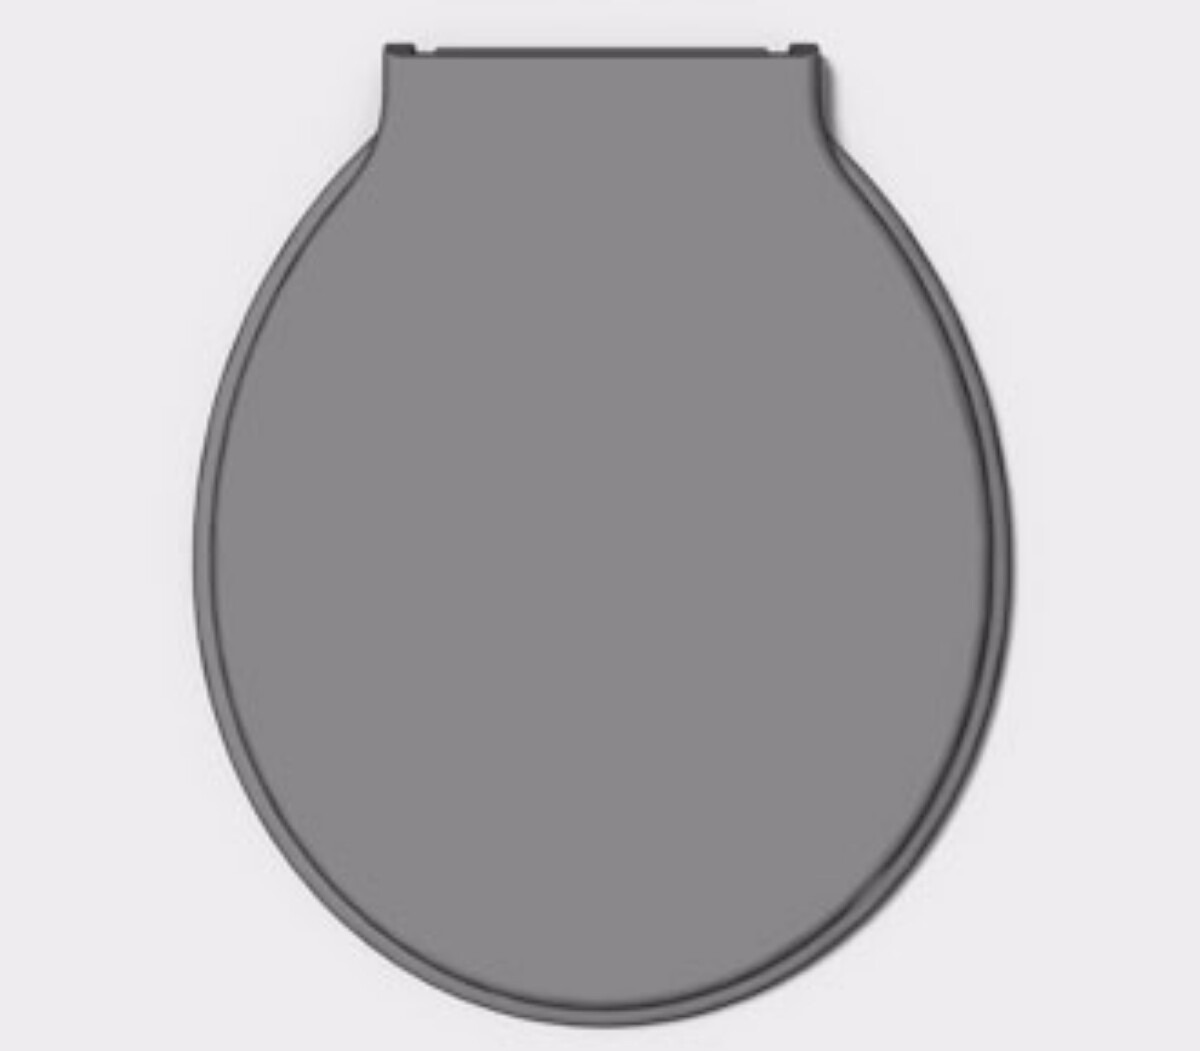 Assento Sanitário Plástico Cinza / Tampa Bacia Vaso Banheiro R$ 19  #685D6E 1200x1051 Assento De Banheiro Para Idoso